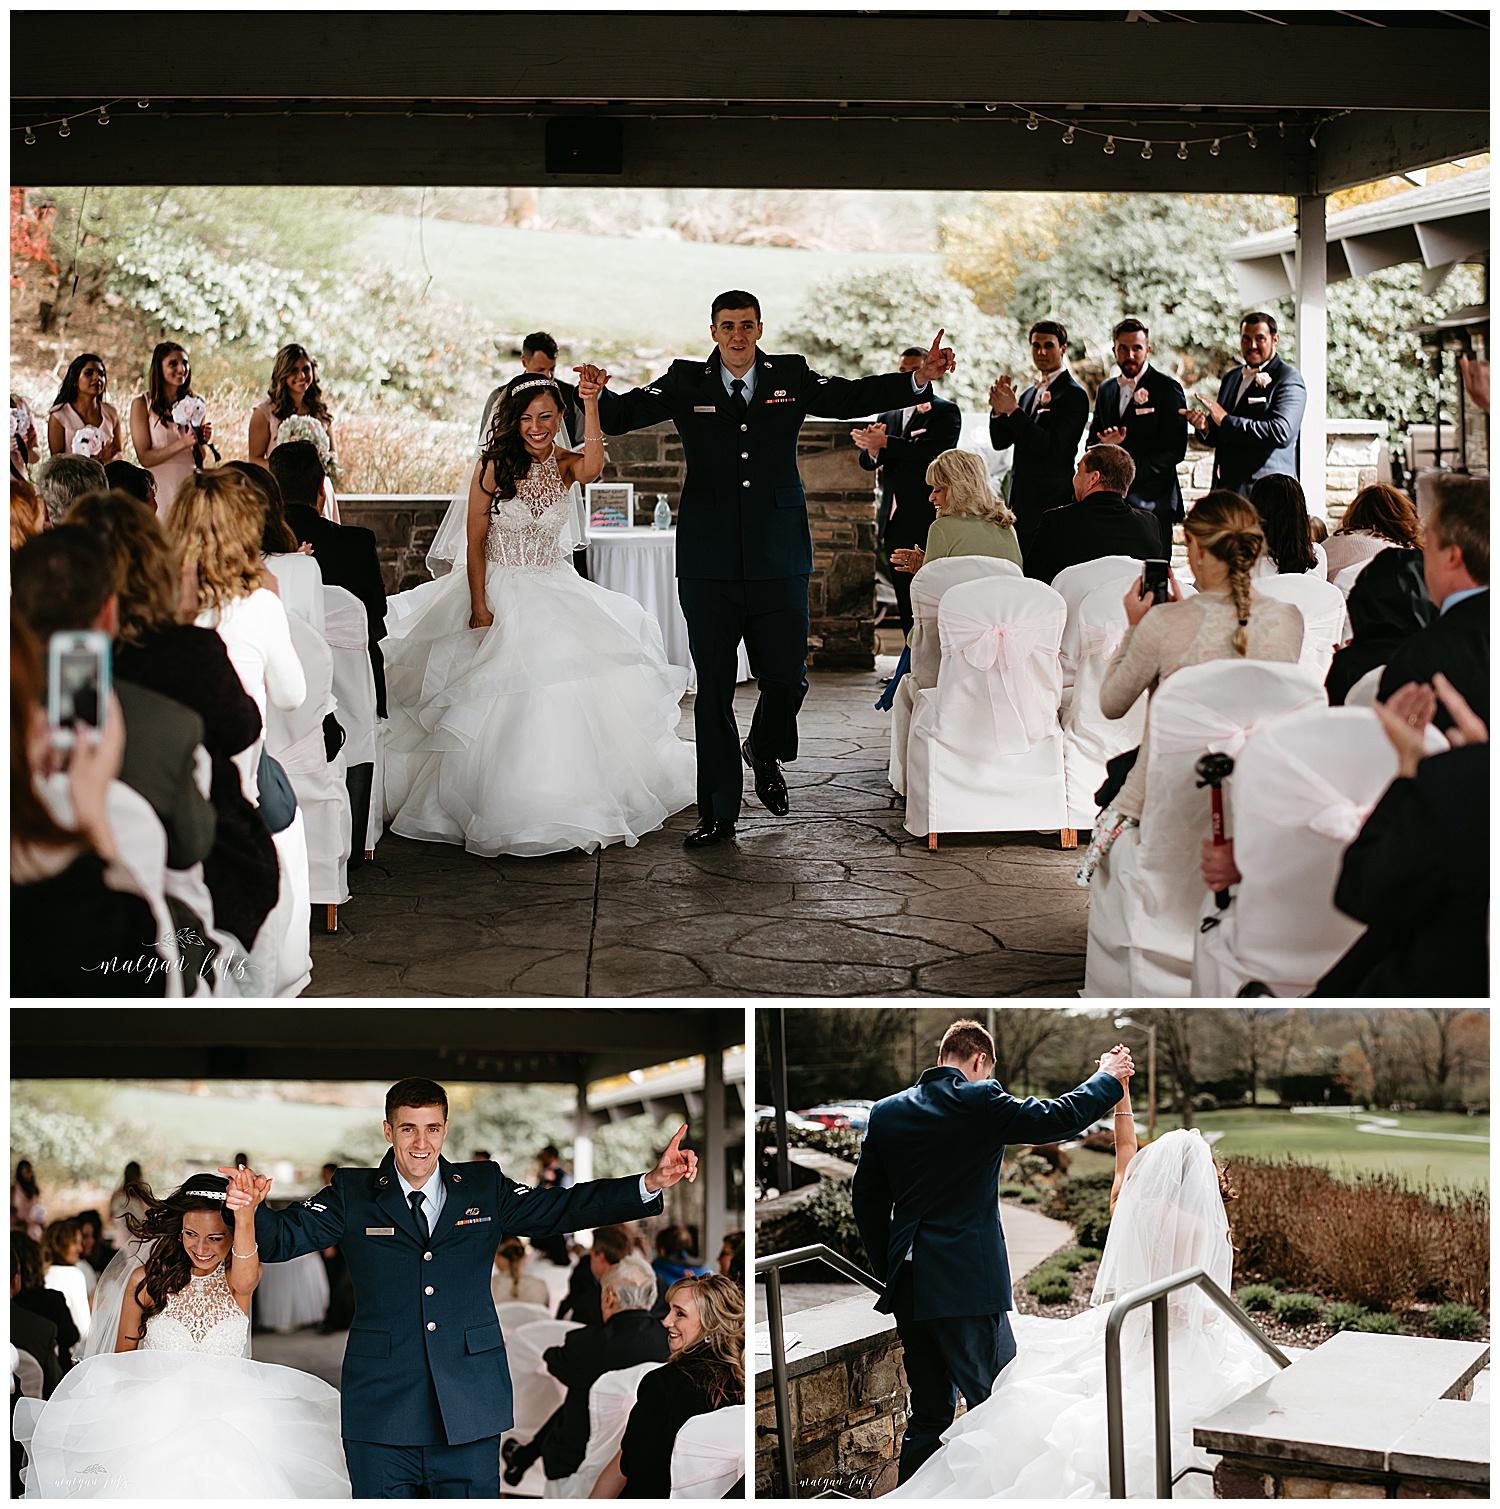 NEPA-Lehigh-Valley-Wedding-Photographer-at-Glen-Oak-Country-Club-Clarks-Summit-PA_0047.jpg